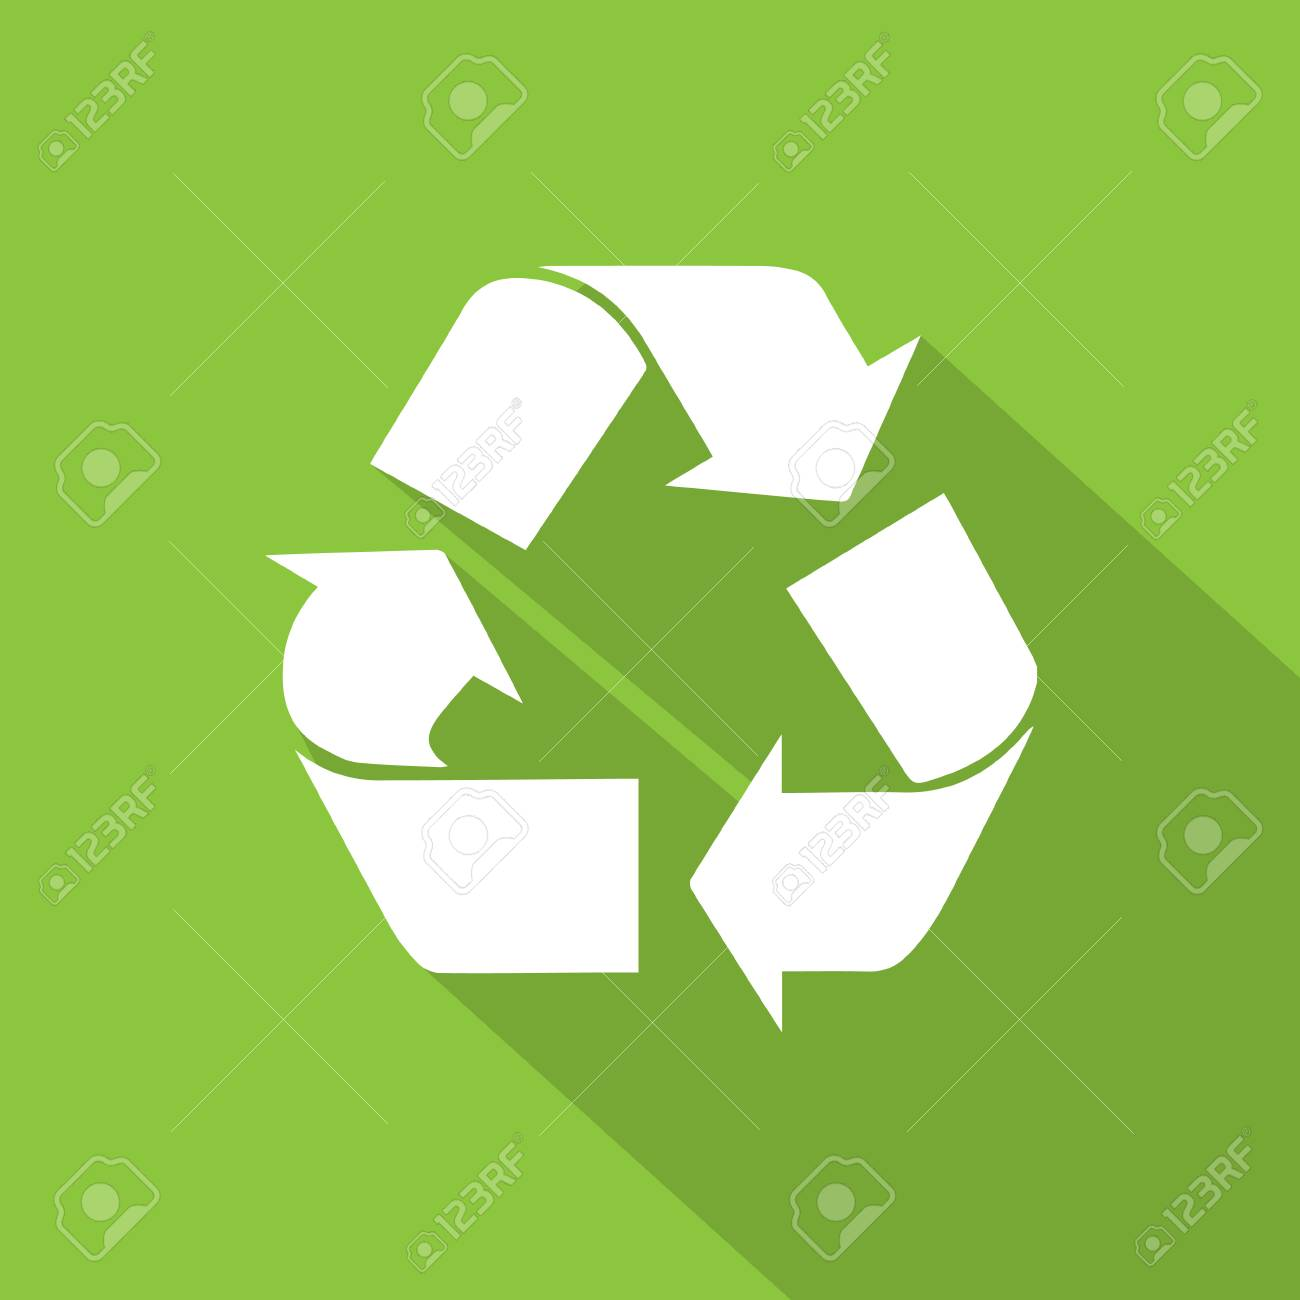 Recycle symbol icon flat icon with shadow white on green background recycle symbol icon flat icon with shadow white on green background stock vector 36778517 buycottarizona Choice Image